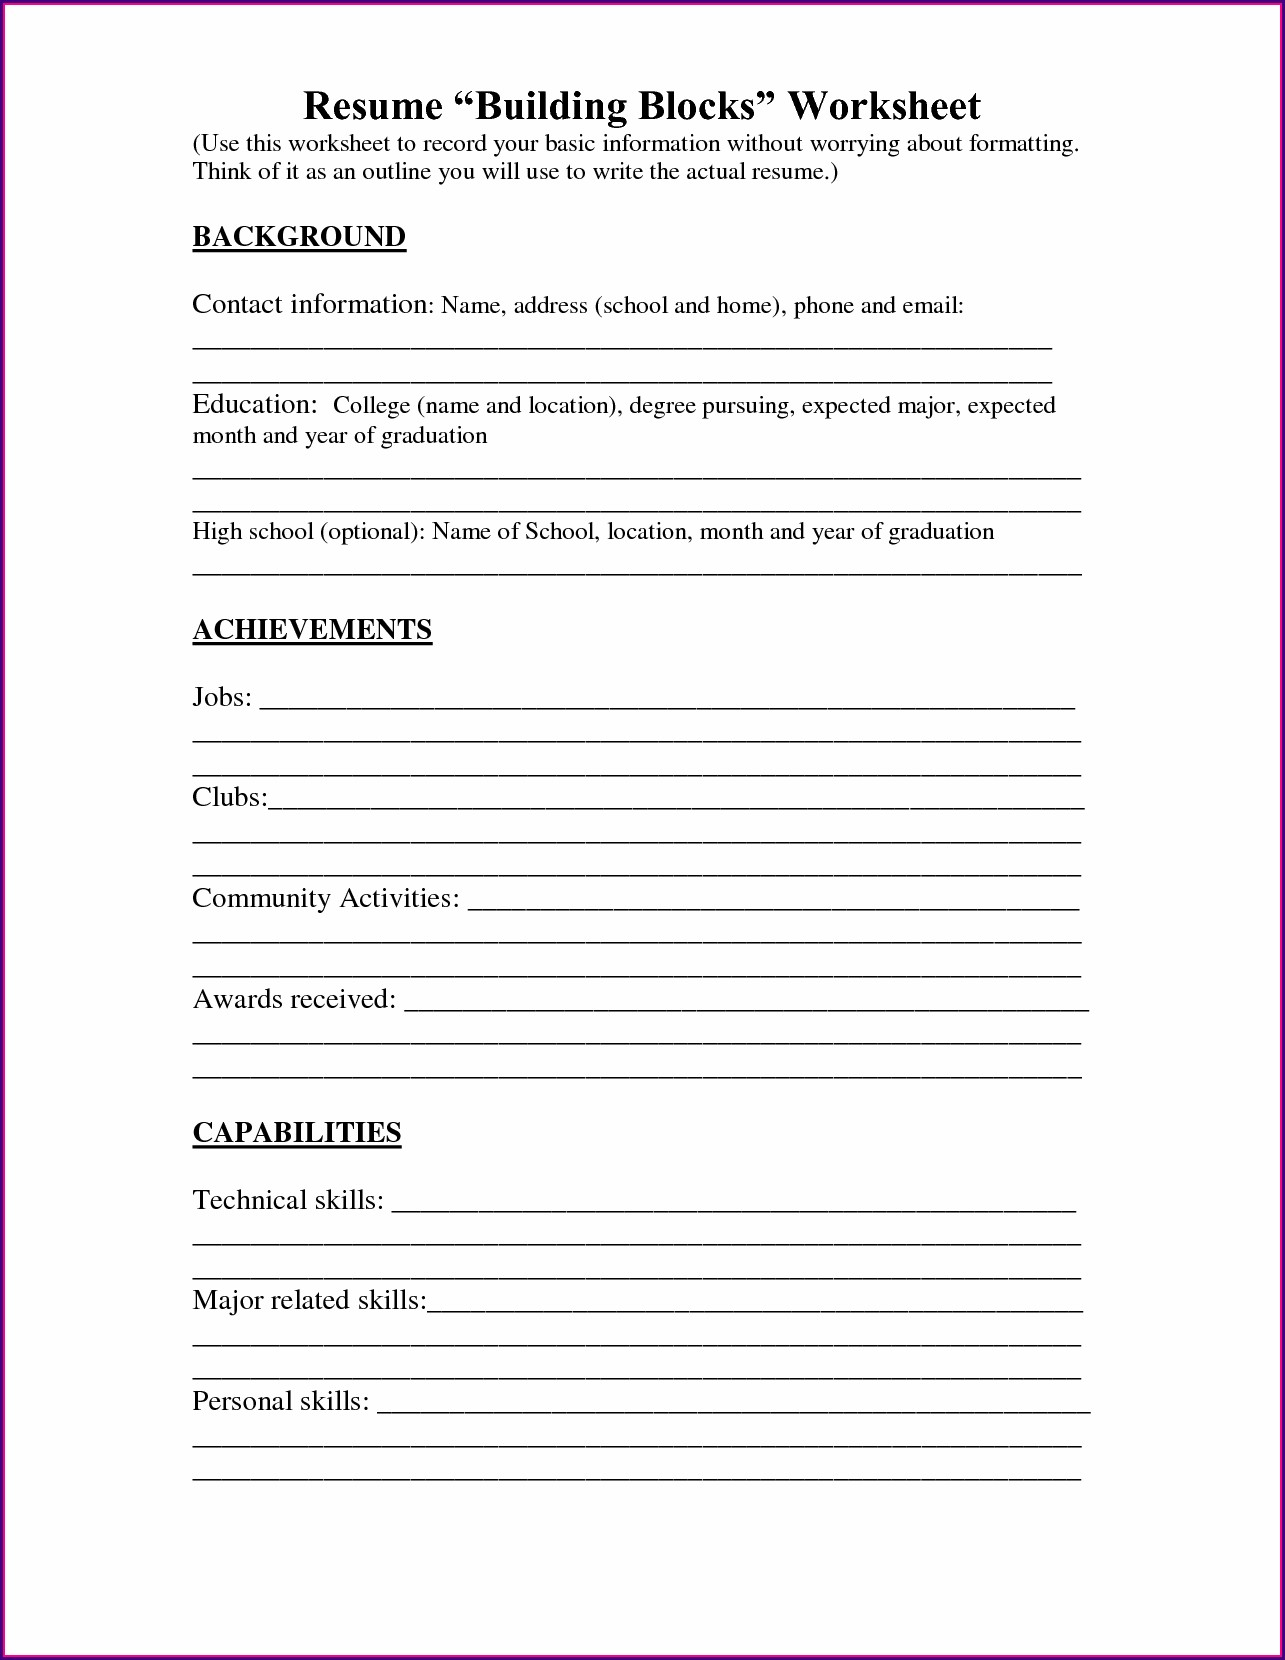 Free High School Resume Builder